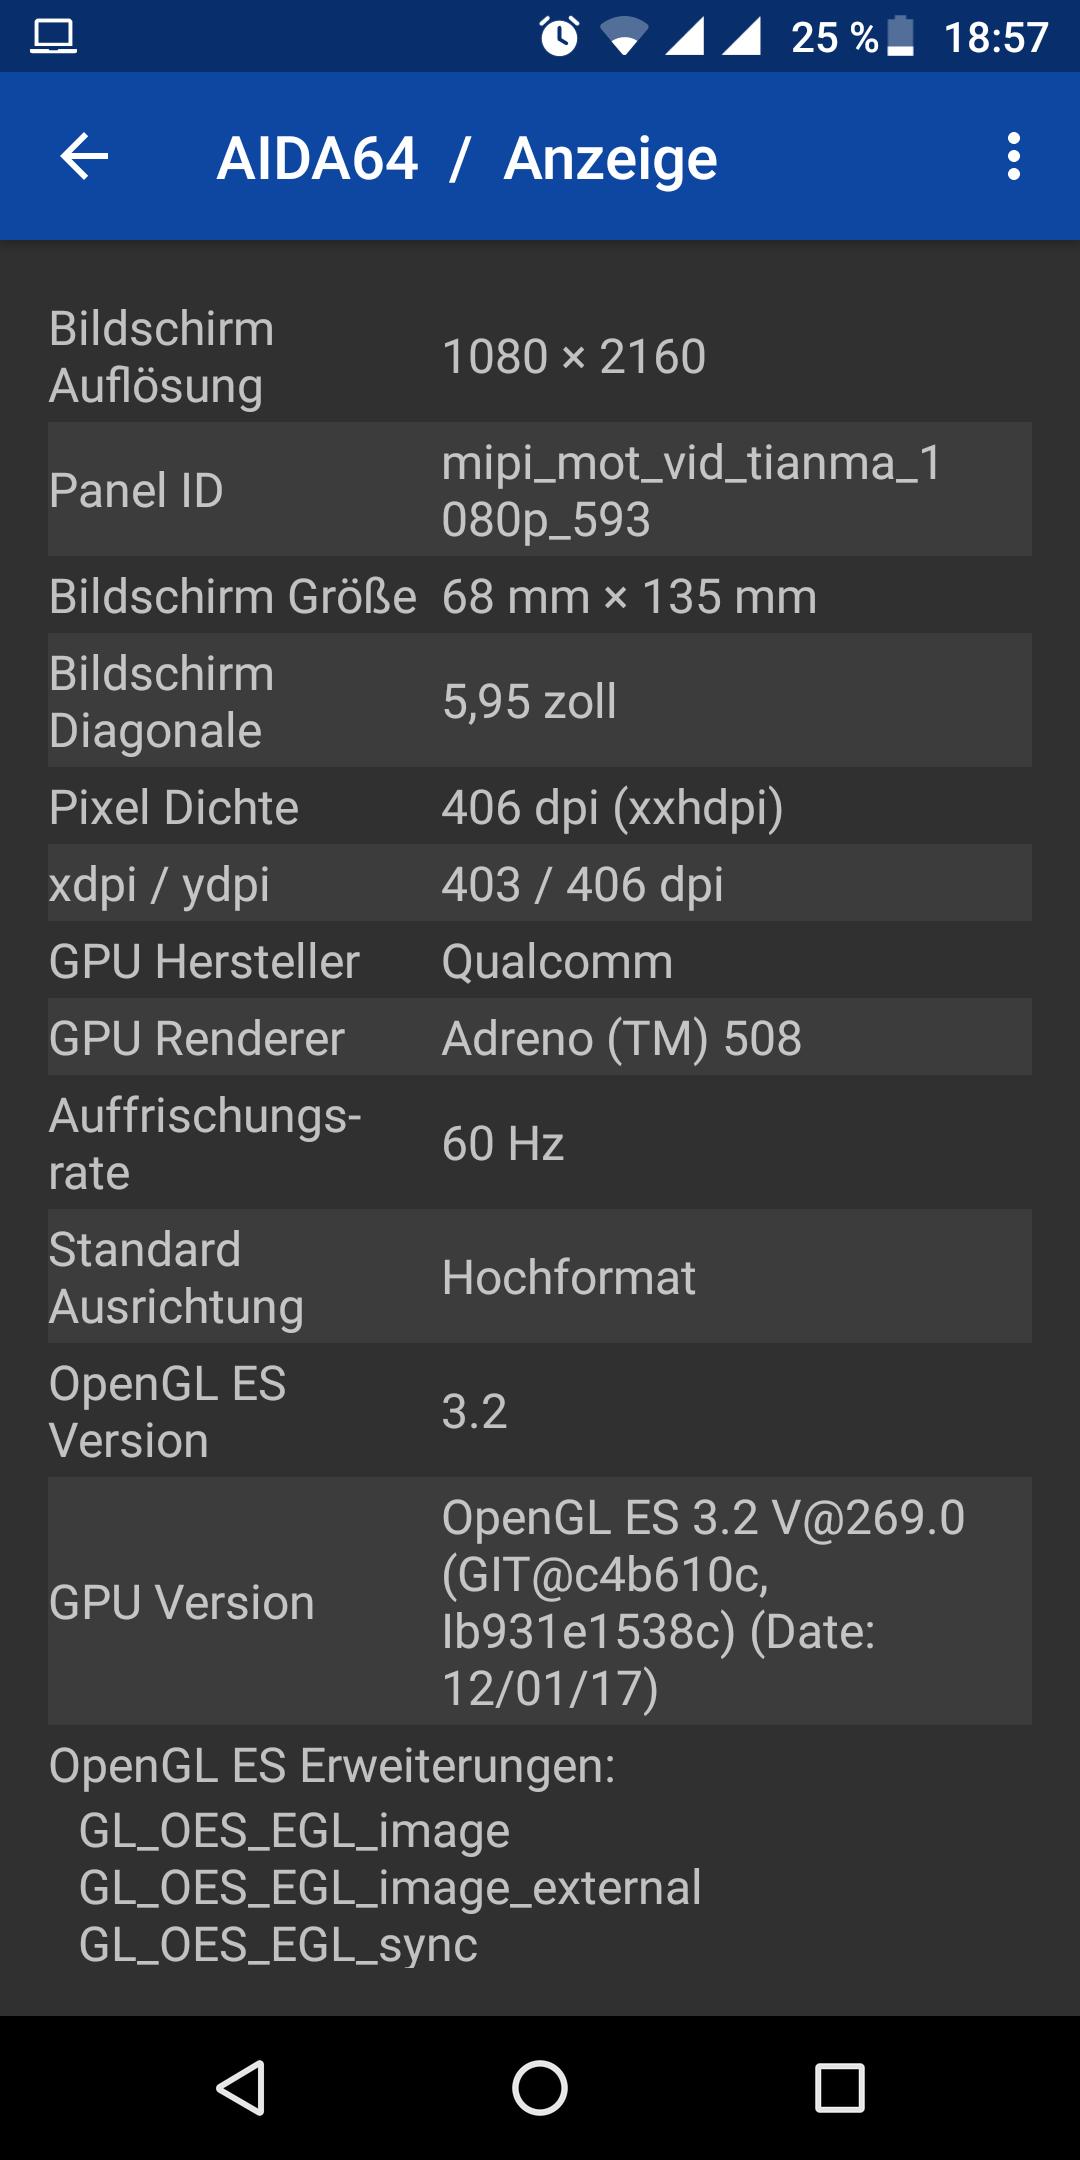 Screenshot_20180616-185705.png